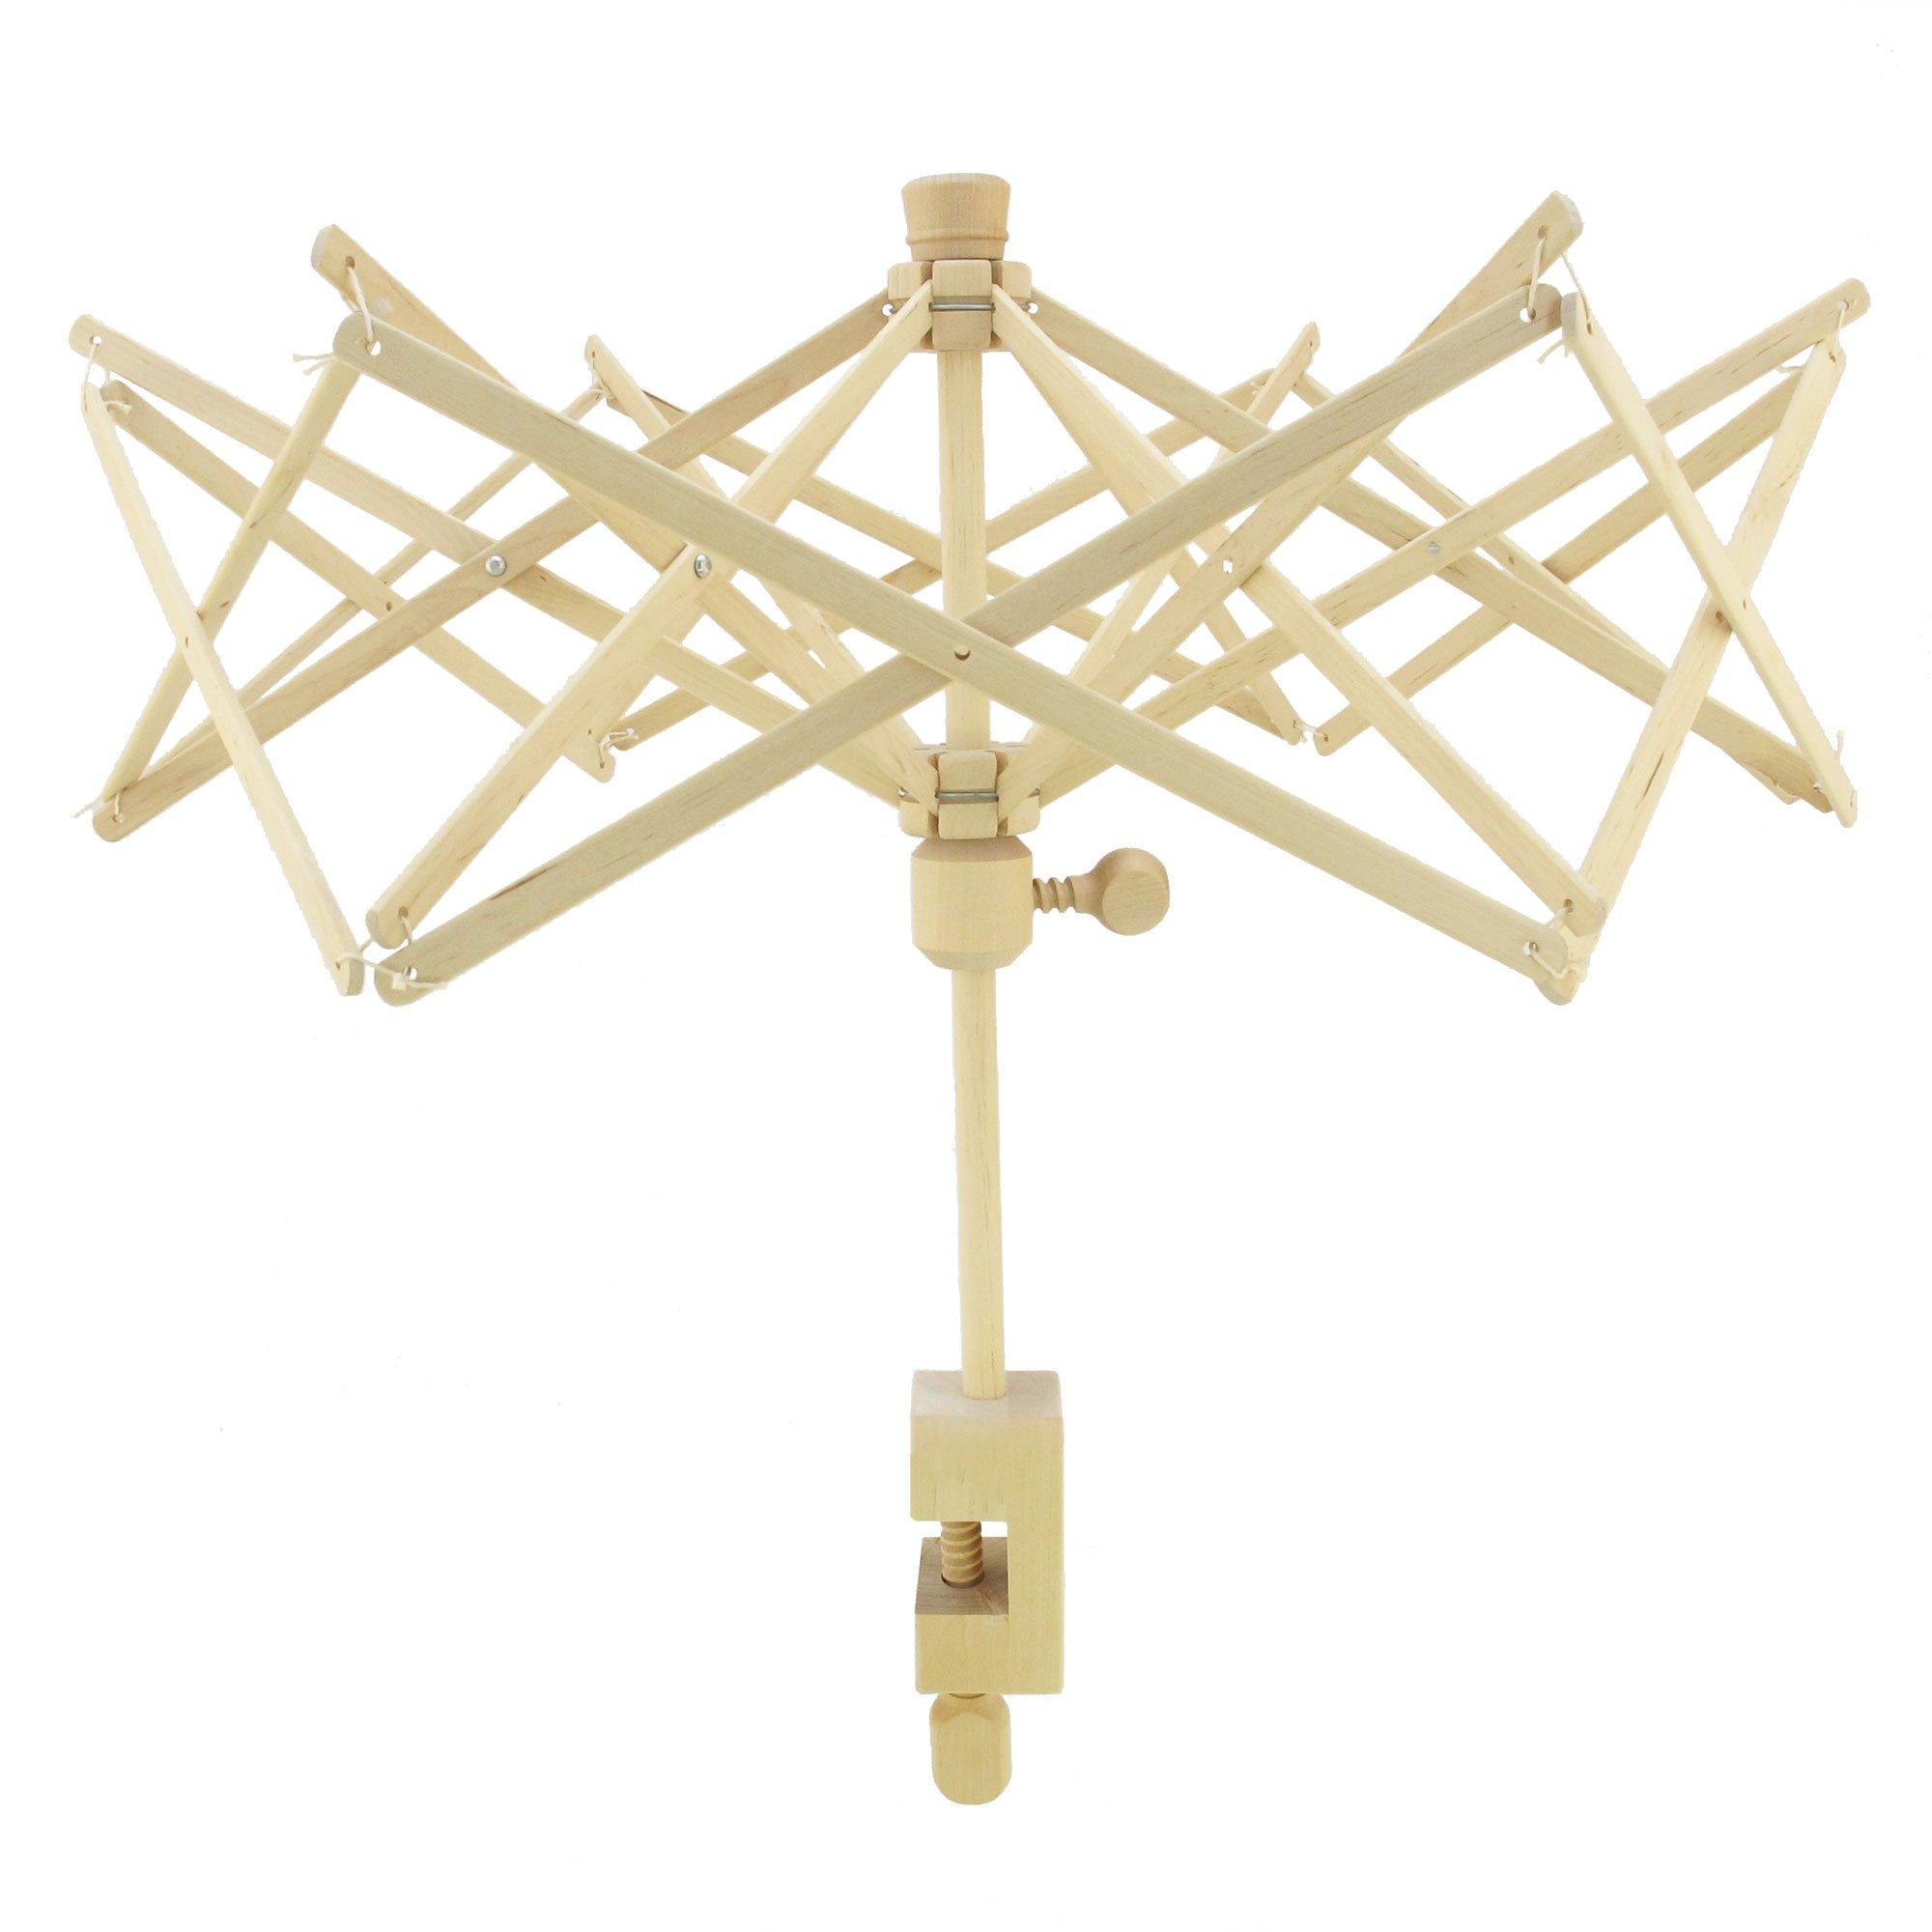 BambooMN Brand Wooden Umbrella Yarn Swift Winder, 1 Set